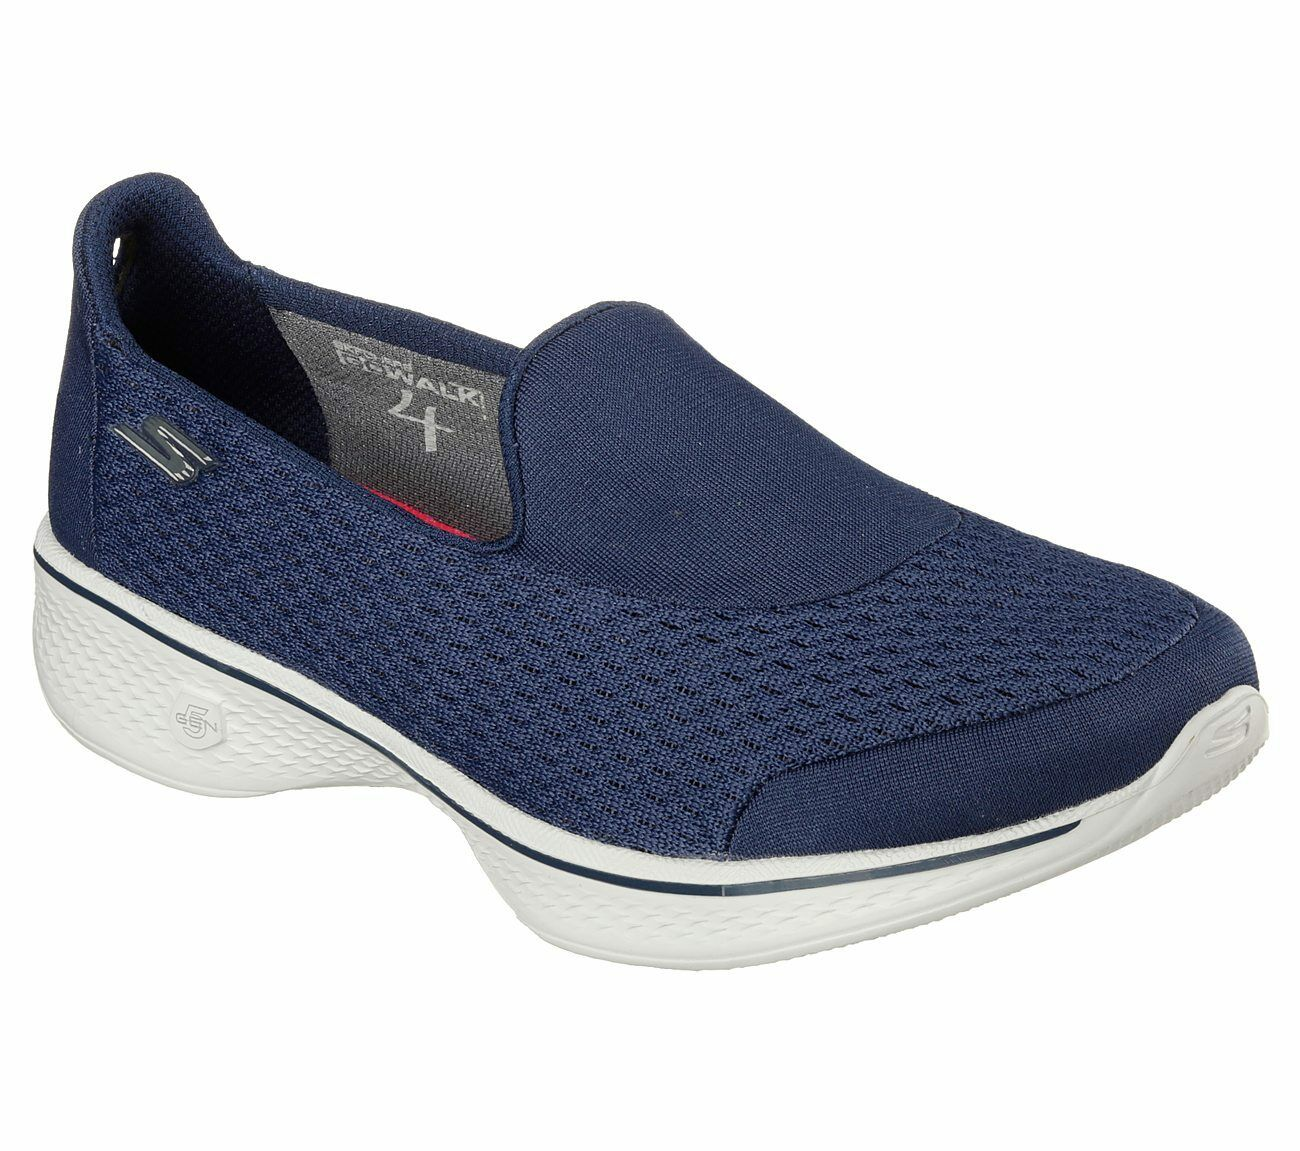 femmes  Skechers 14148 Go Walk 4 PURSUIT Slip On Performance Comfort Casual  Chaussures